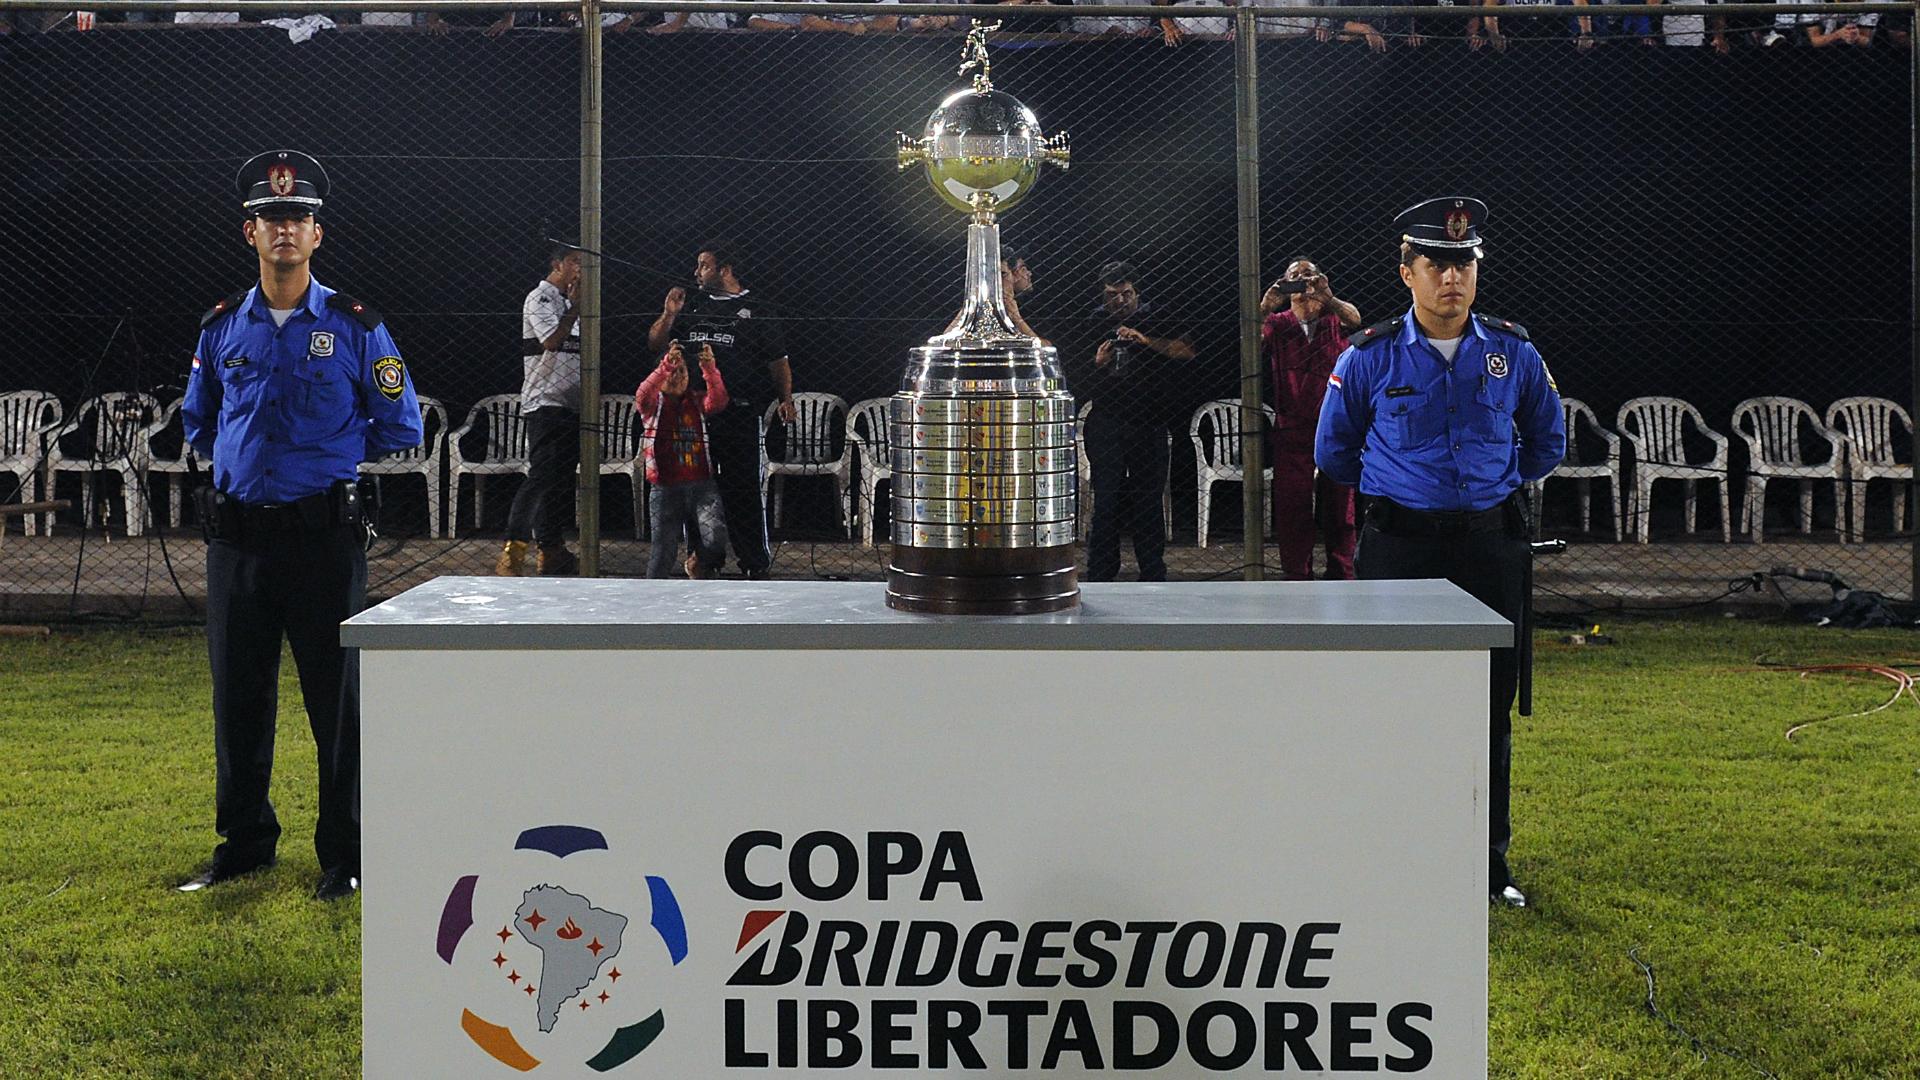 Final de la Copa Libertadores 2018  cuándo es d837dffb05042